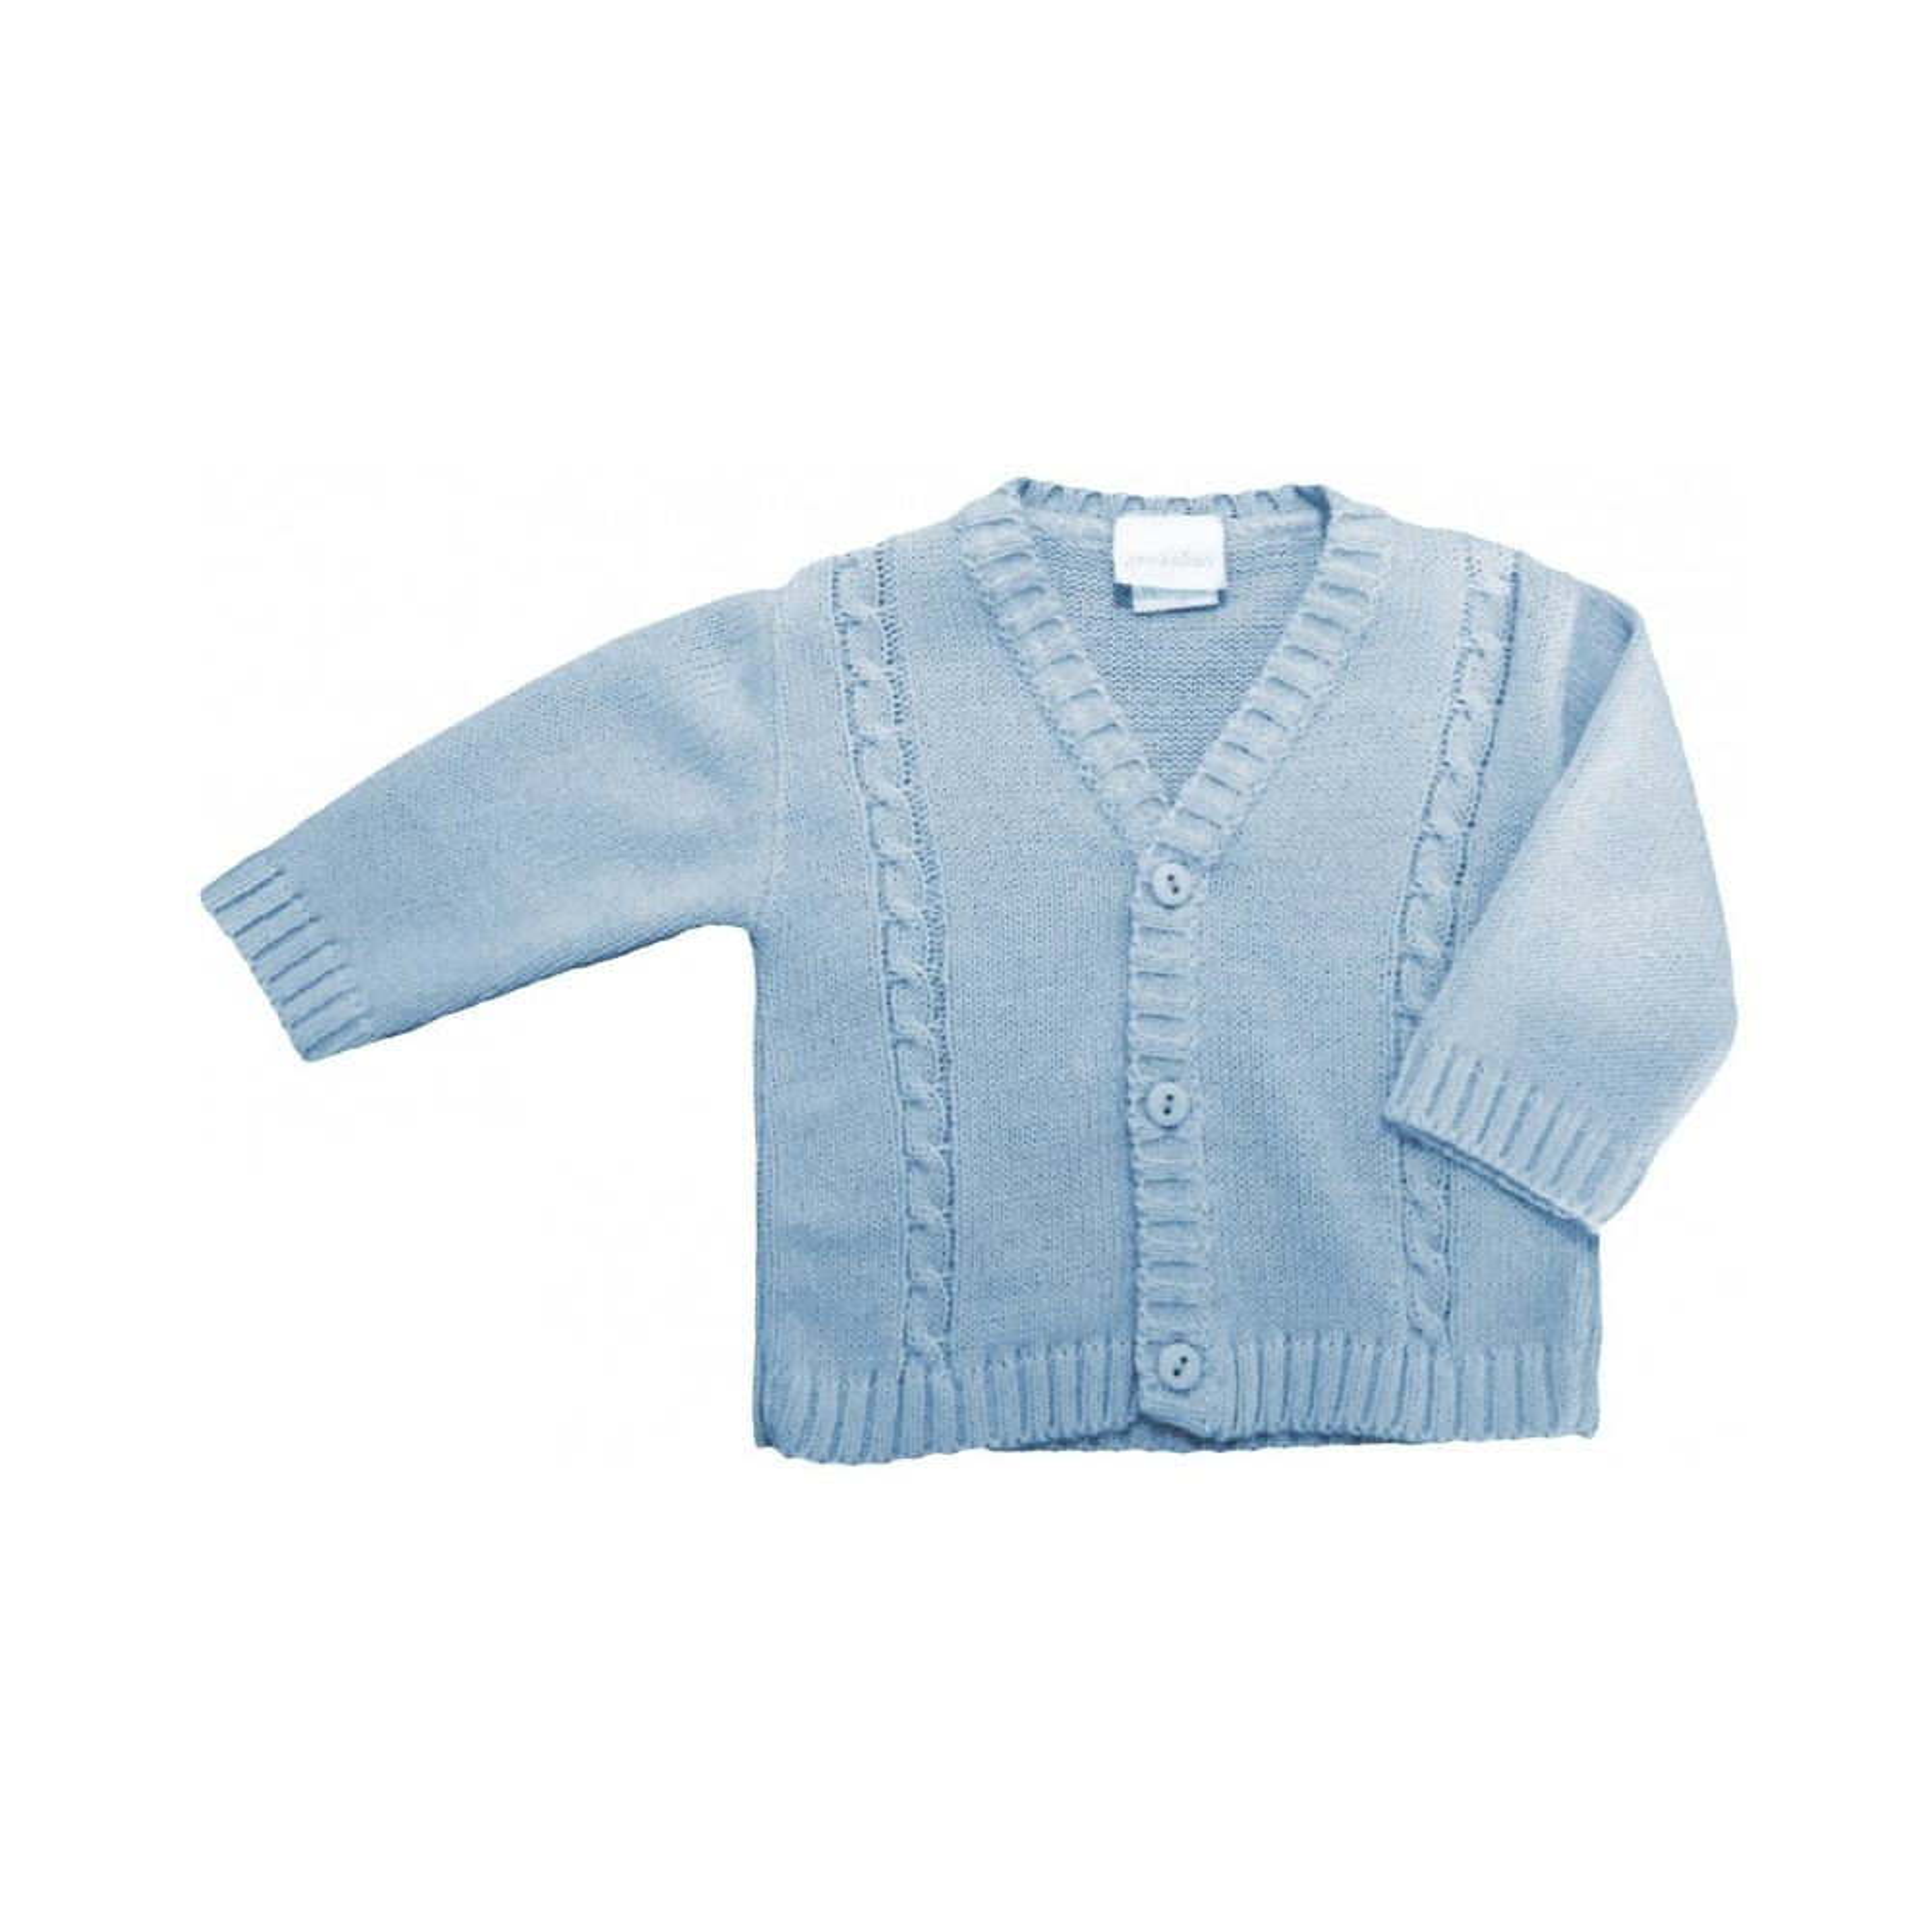 07e4509013f5 dandelion-pex-kinder-premature-baby-clothing